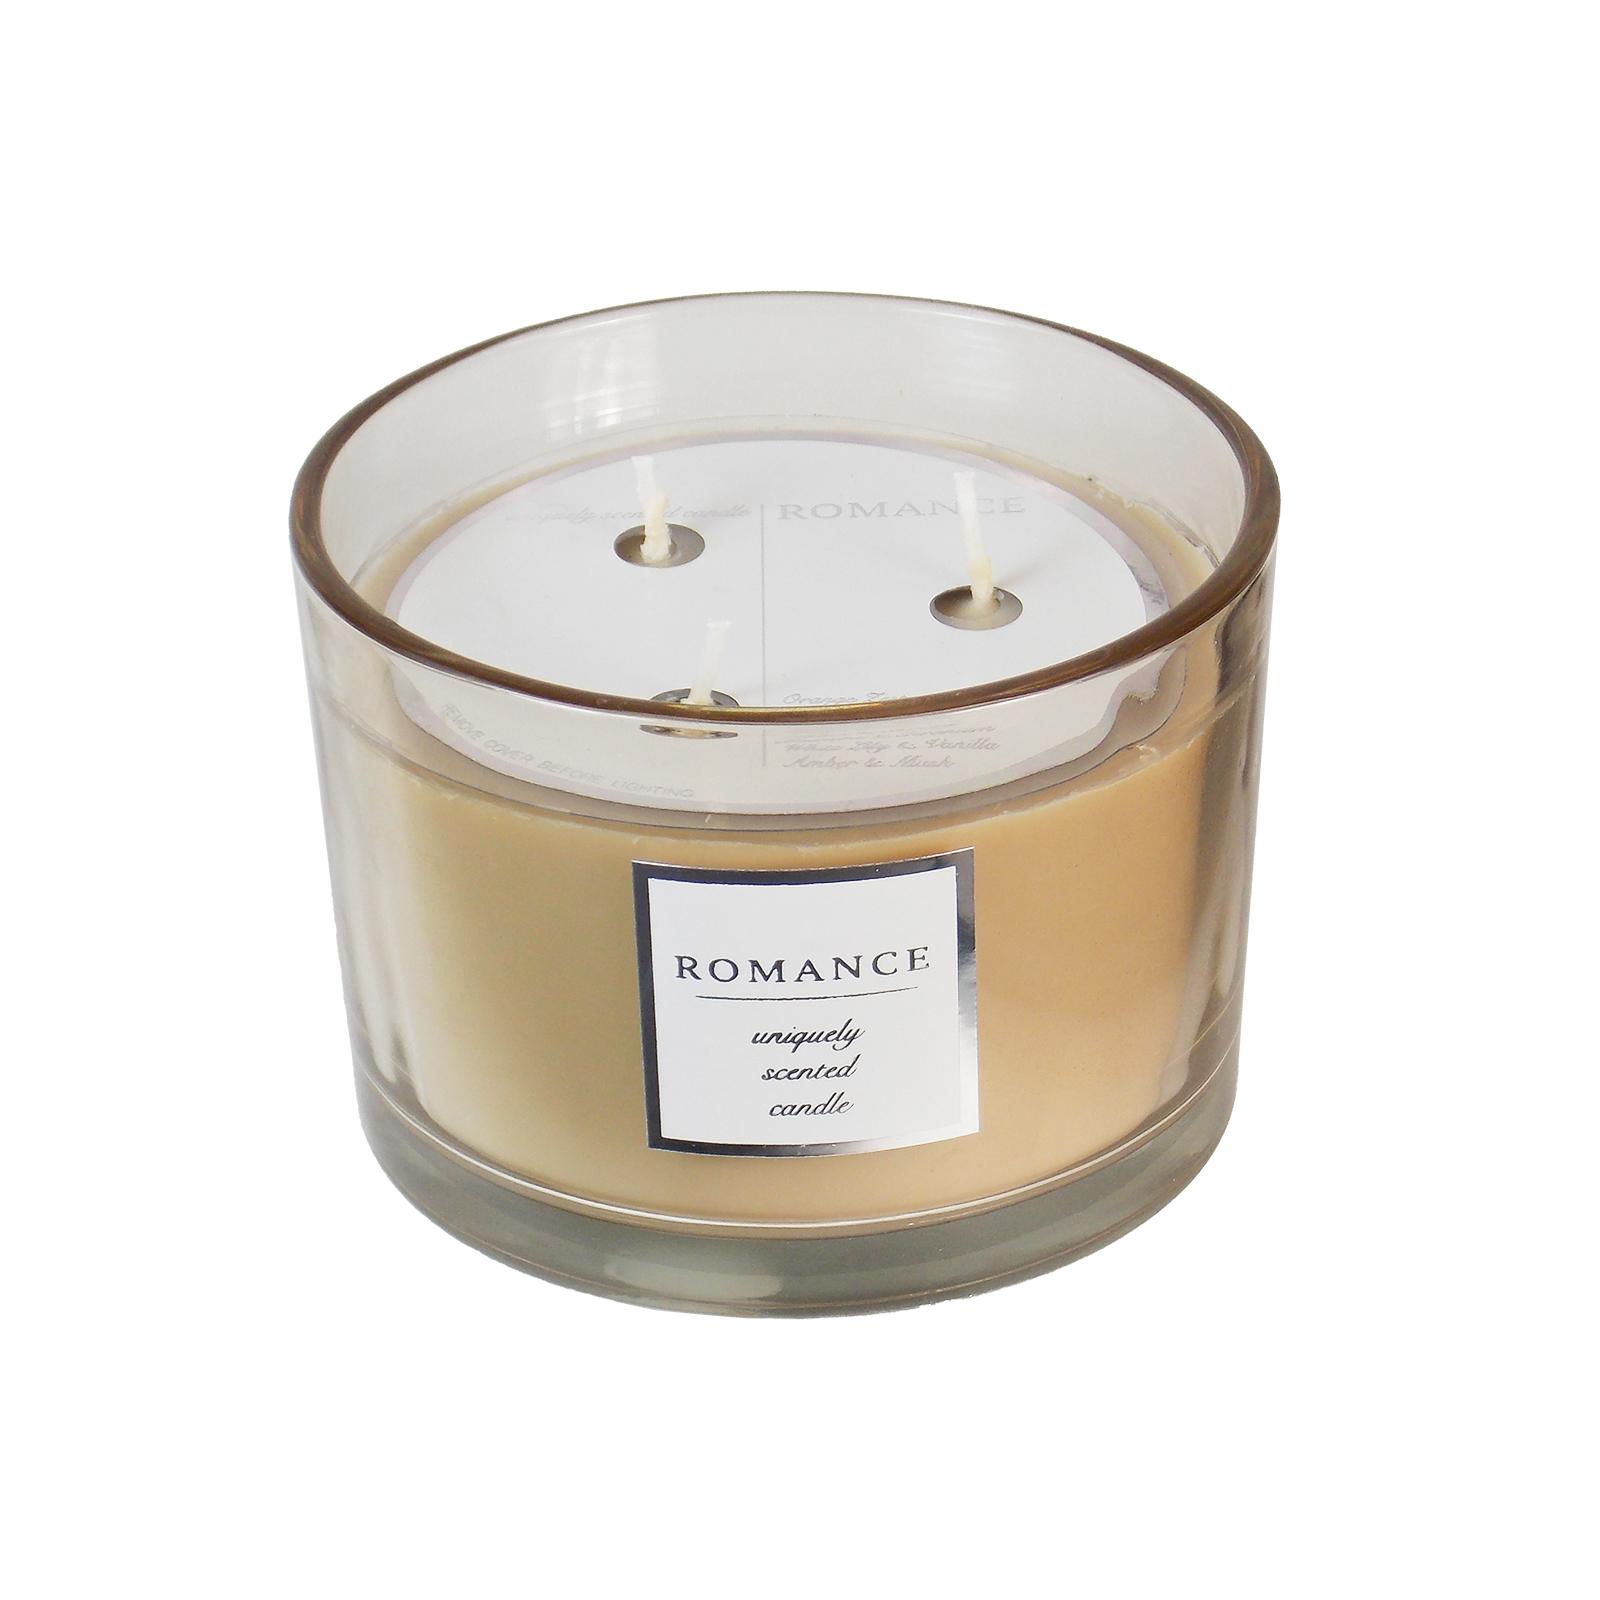 Romance 3-Wick Candle - 16 oz, Beige & Tan